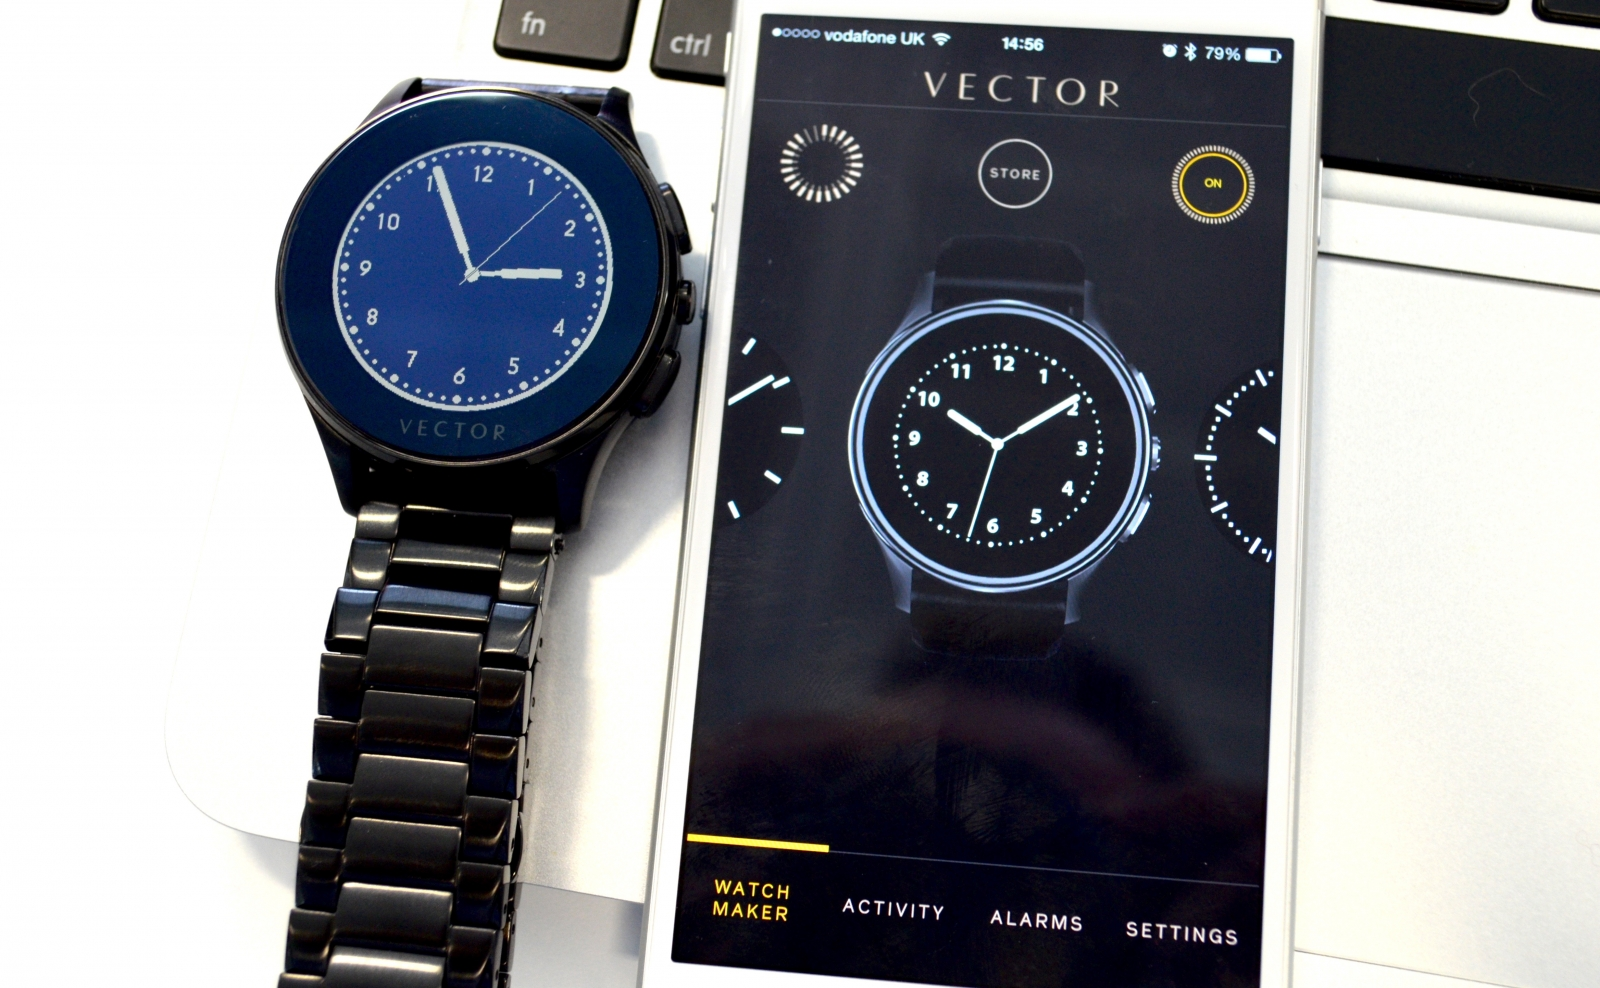 Vector Luna smartwatch app iOS iPhone